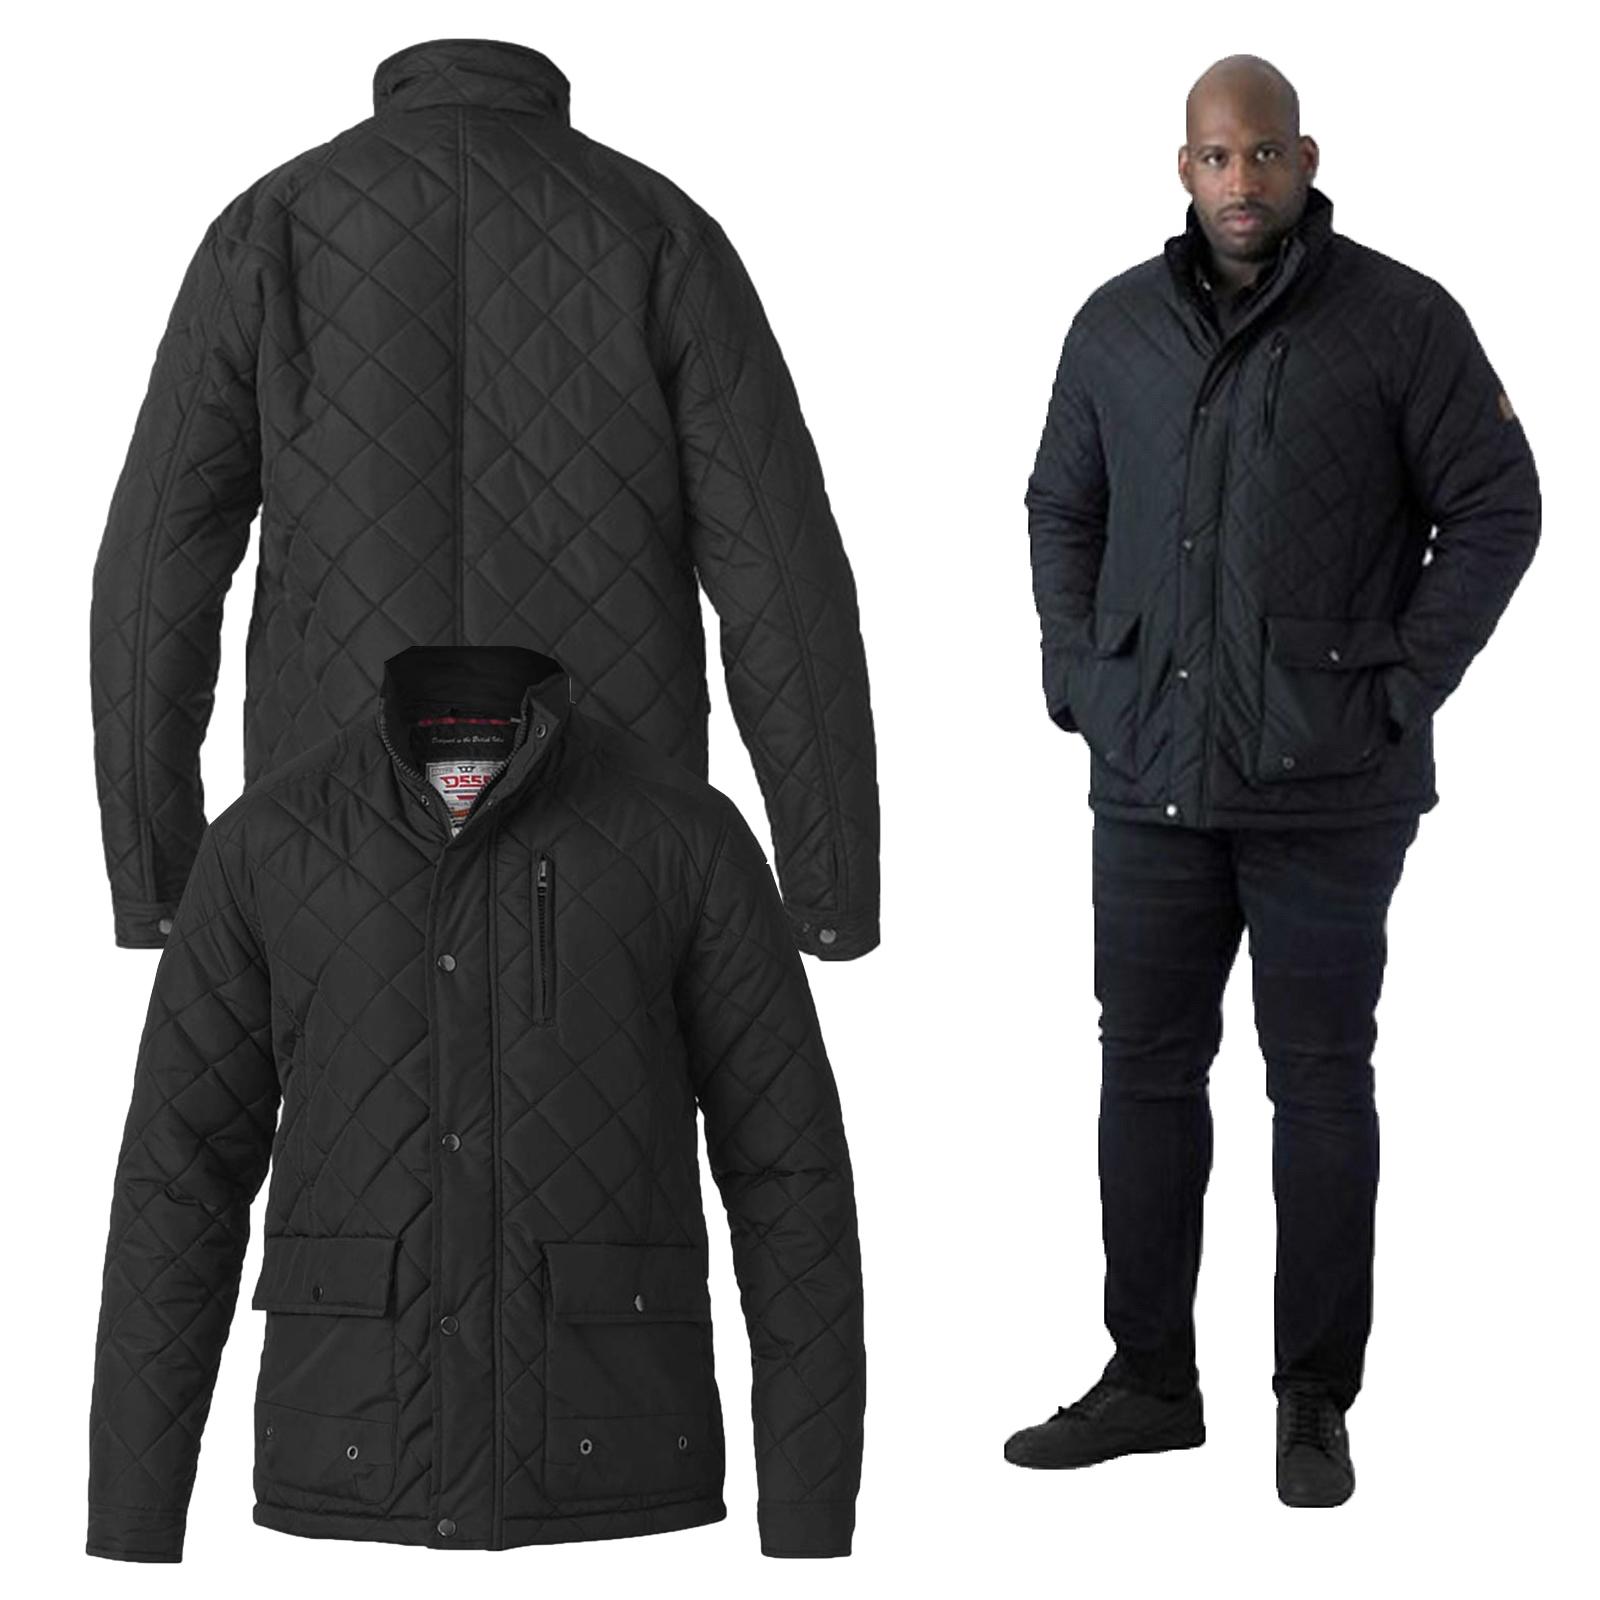 Adults Mens Kingsize Full Zip Hoodie Sweat Top Hooded Pockets Big Plus Size 52